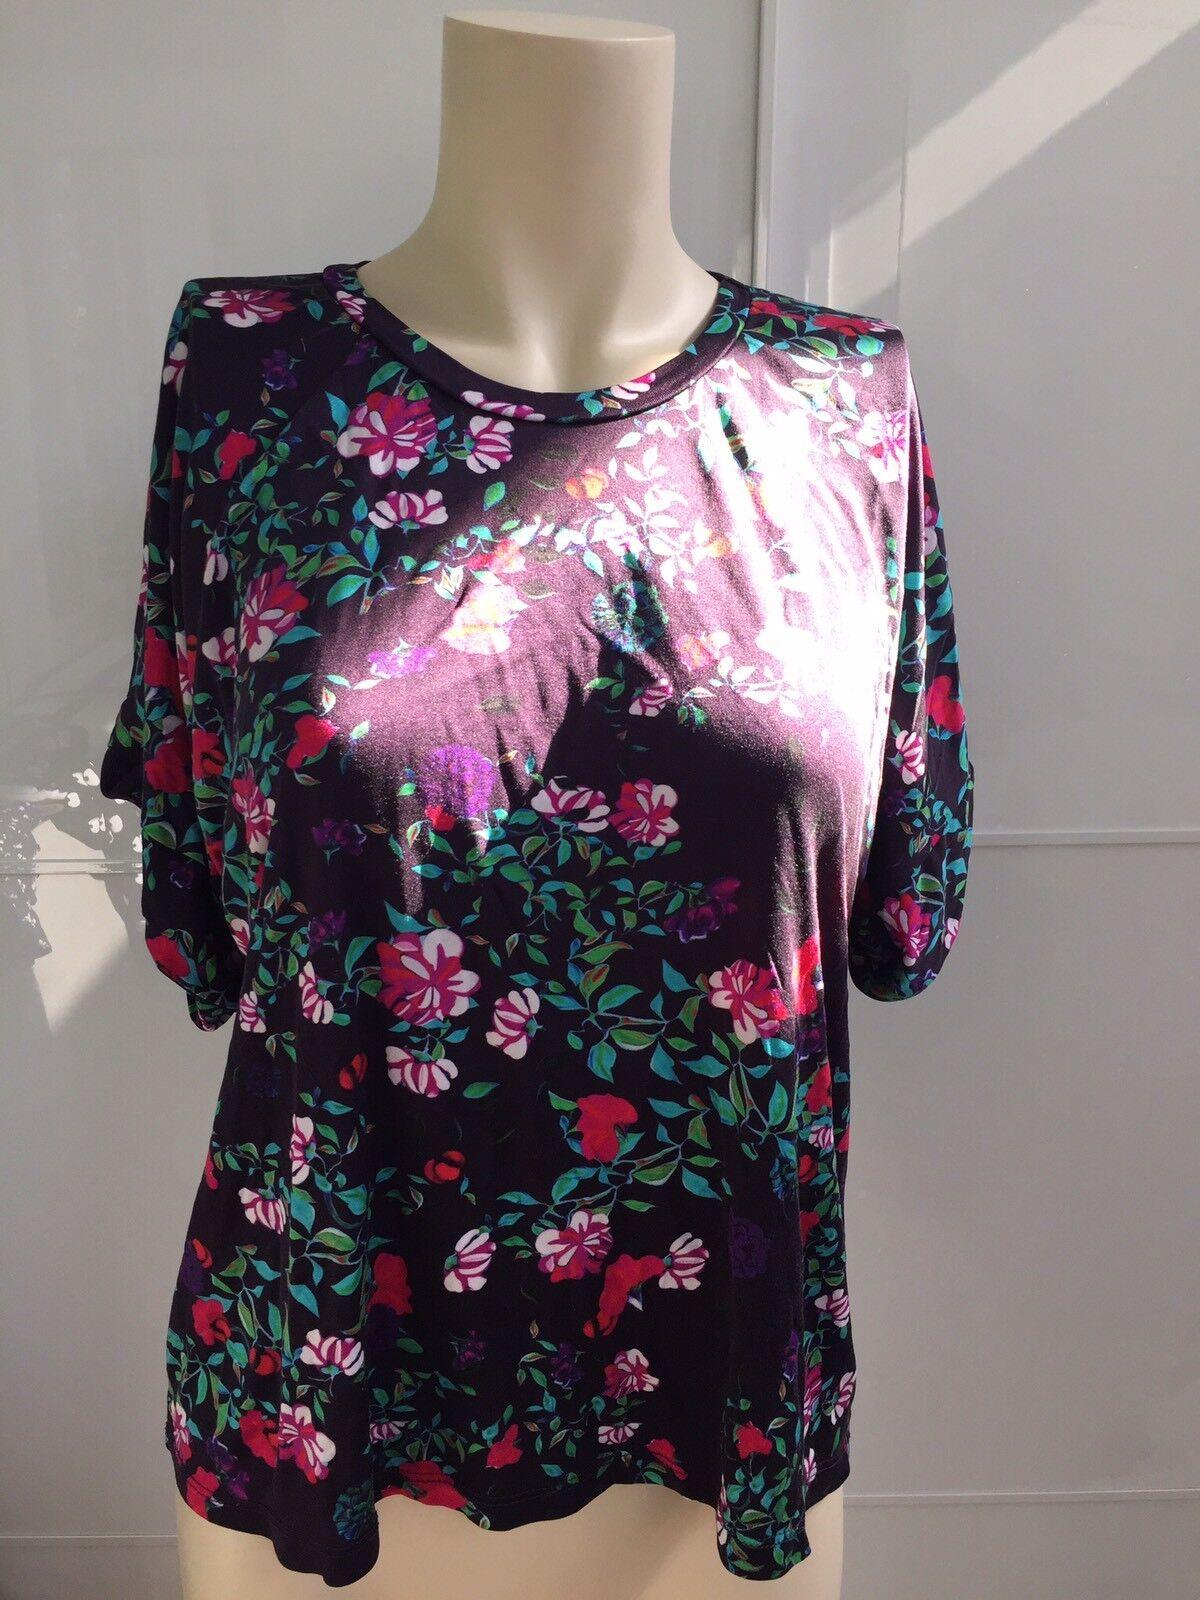 Mary Katrantzou For Topshop Floral schwarz Set Tshirt And Leggings Größe 8